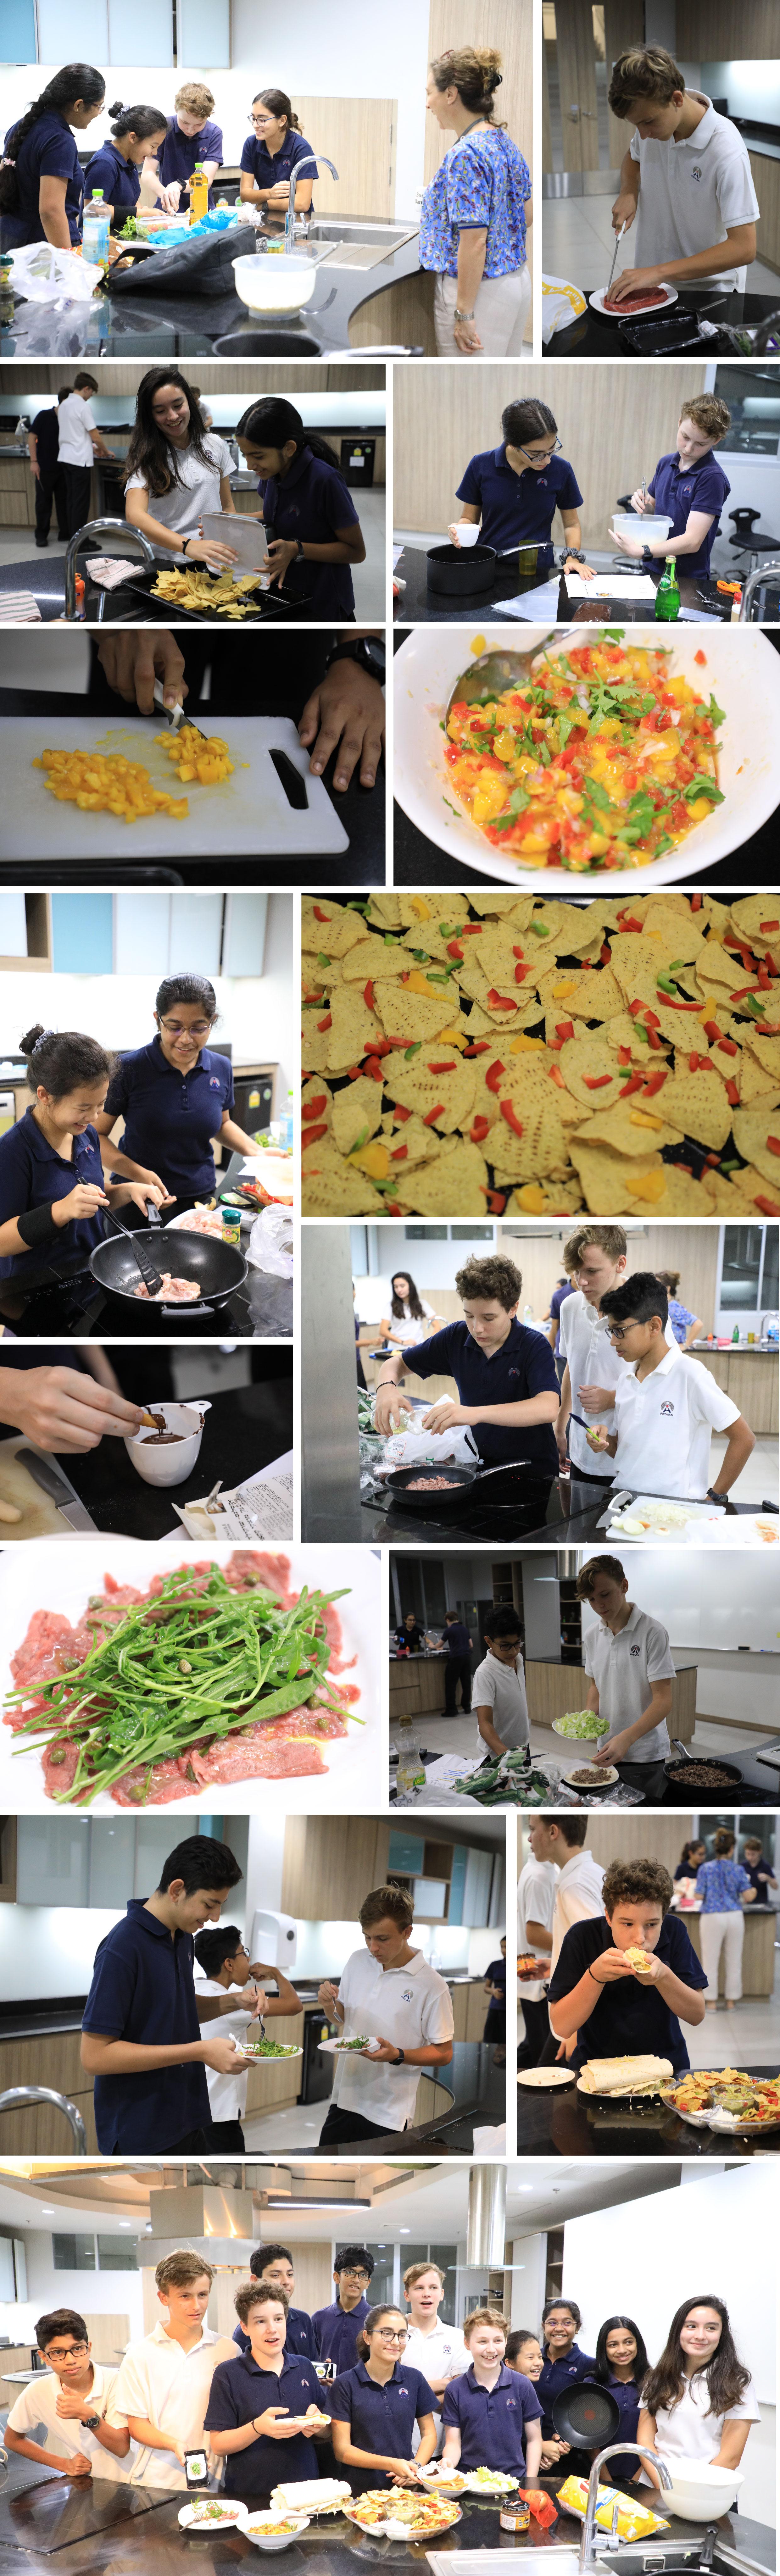 Patana Students prepare Hispanic dishes